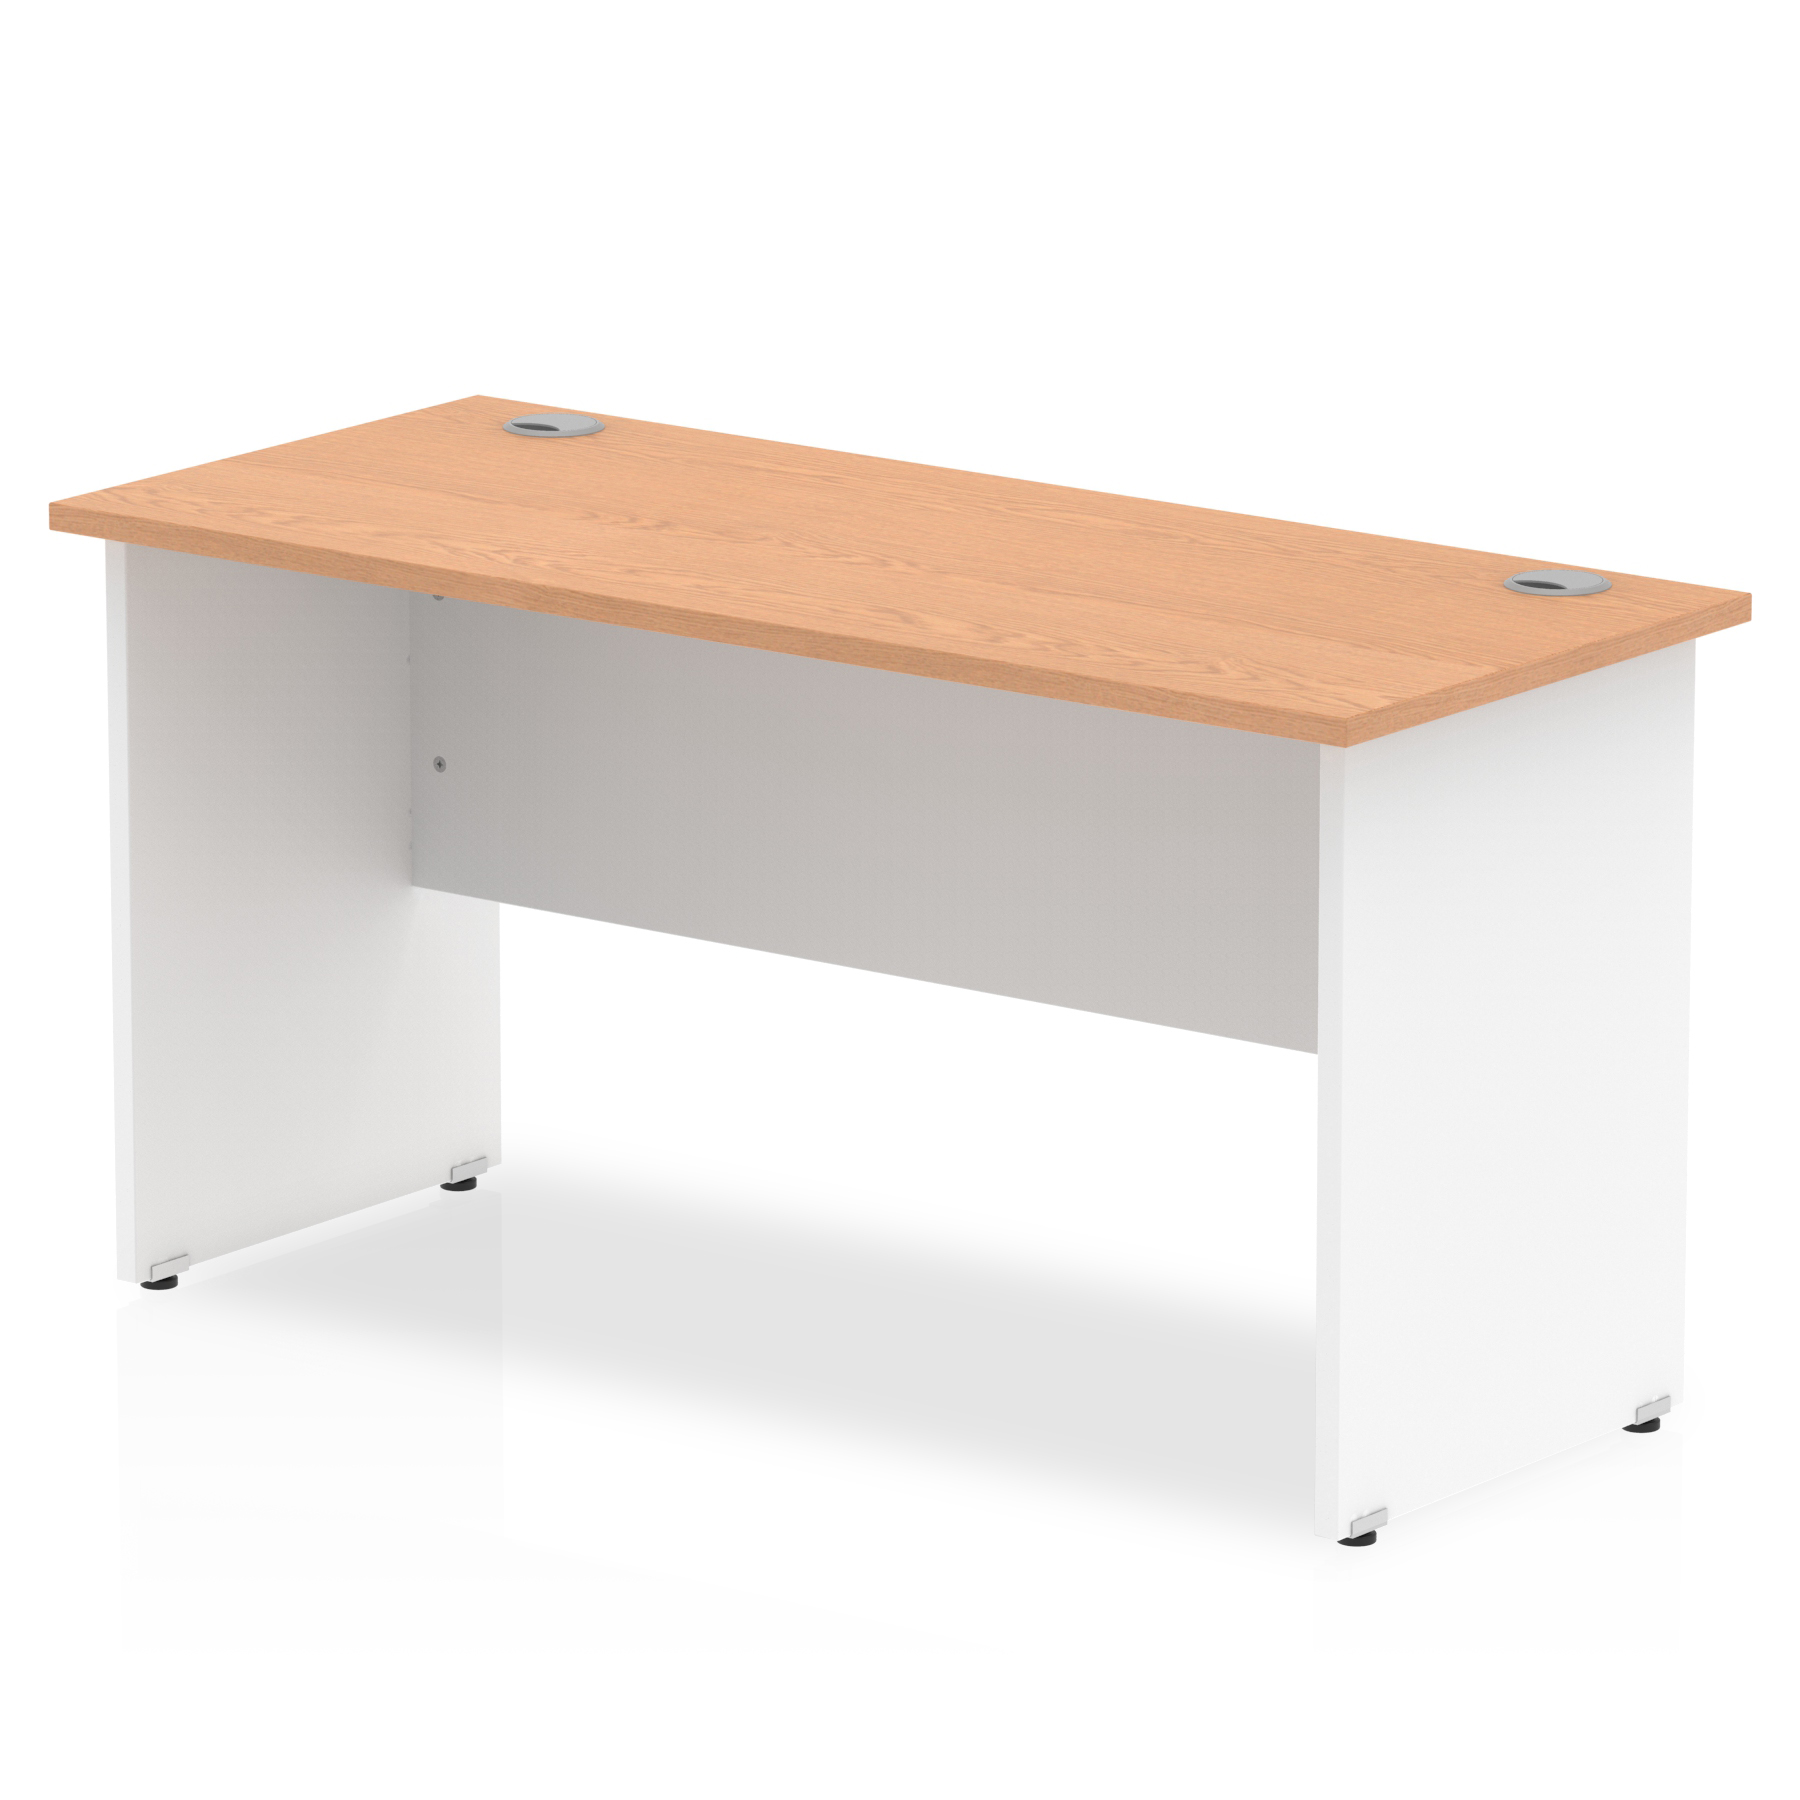 Impulse Panel End 1400/600 Rectangle Desk Oak Top White Panels